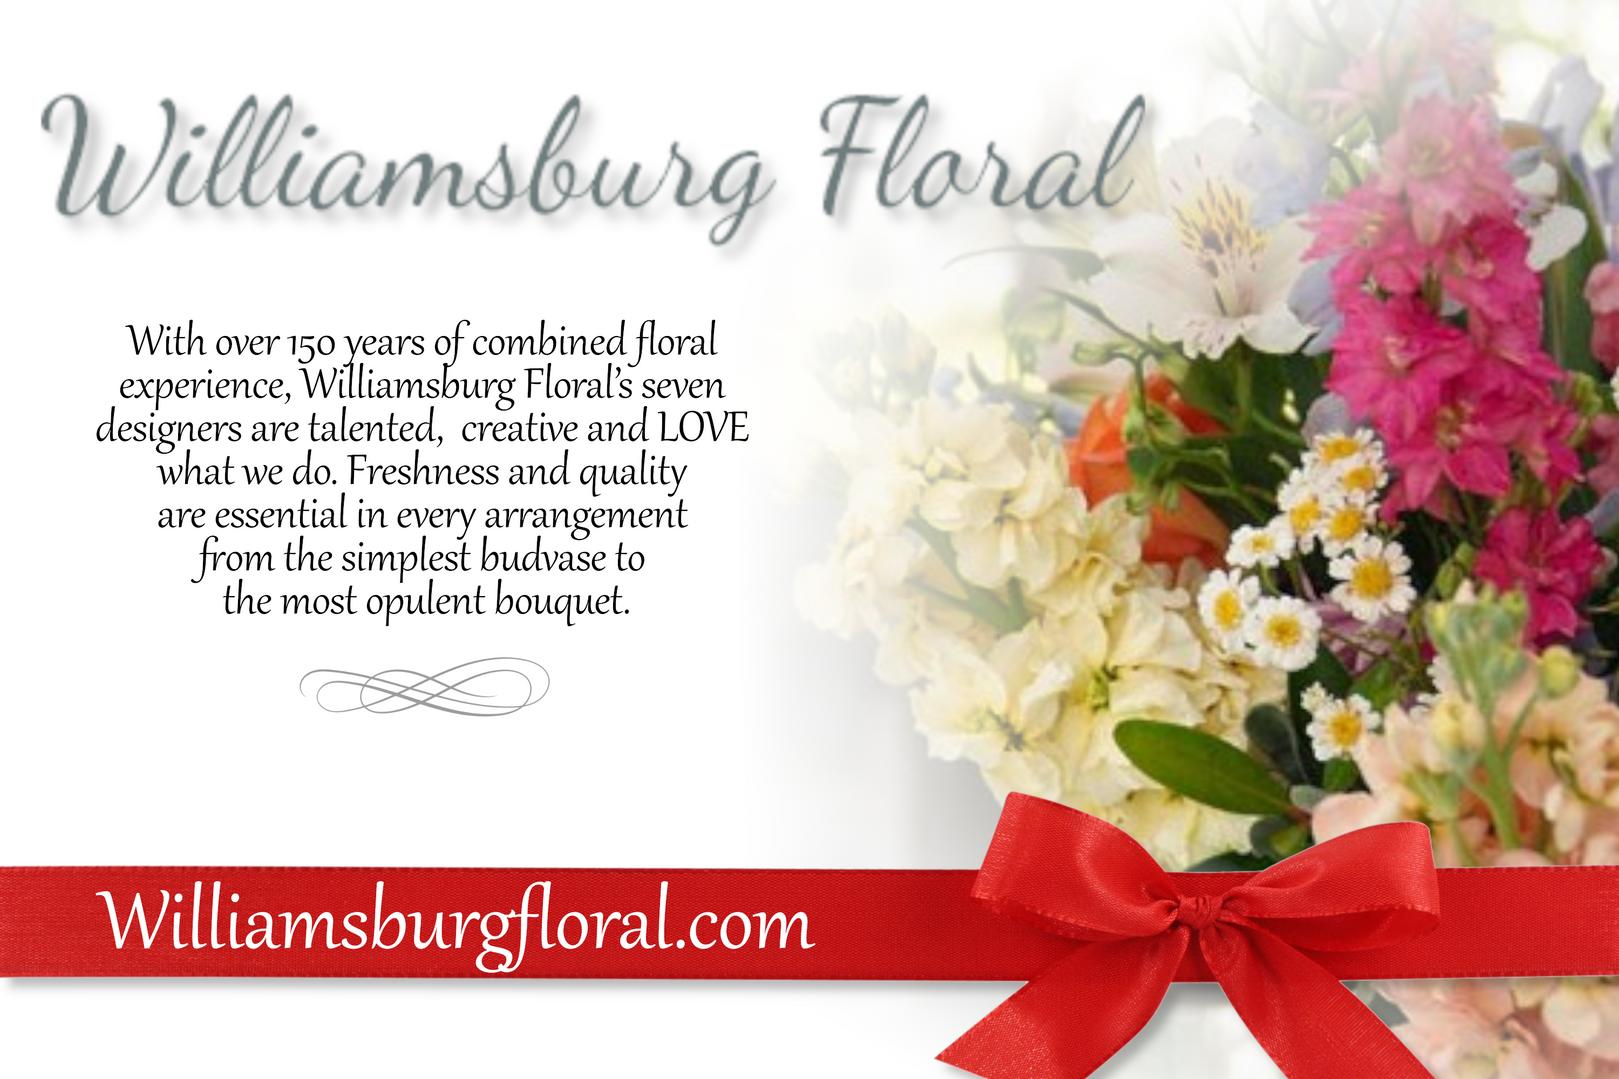 williamsburg floral.png